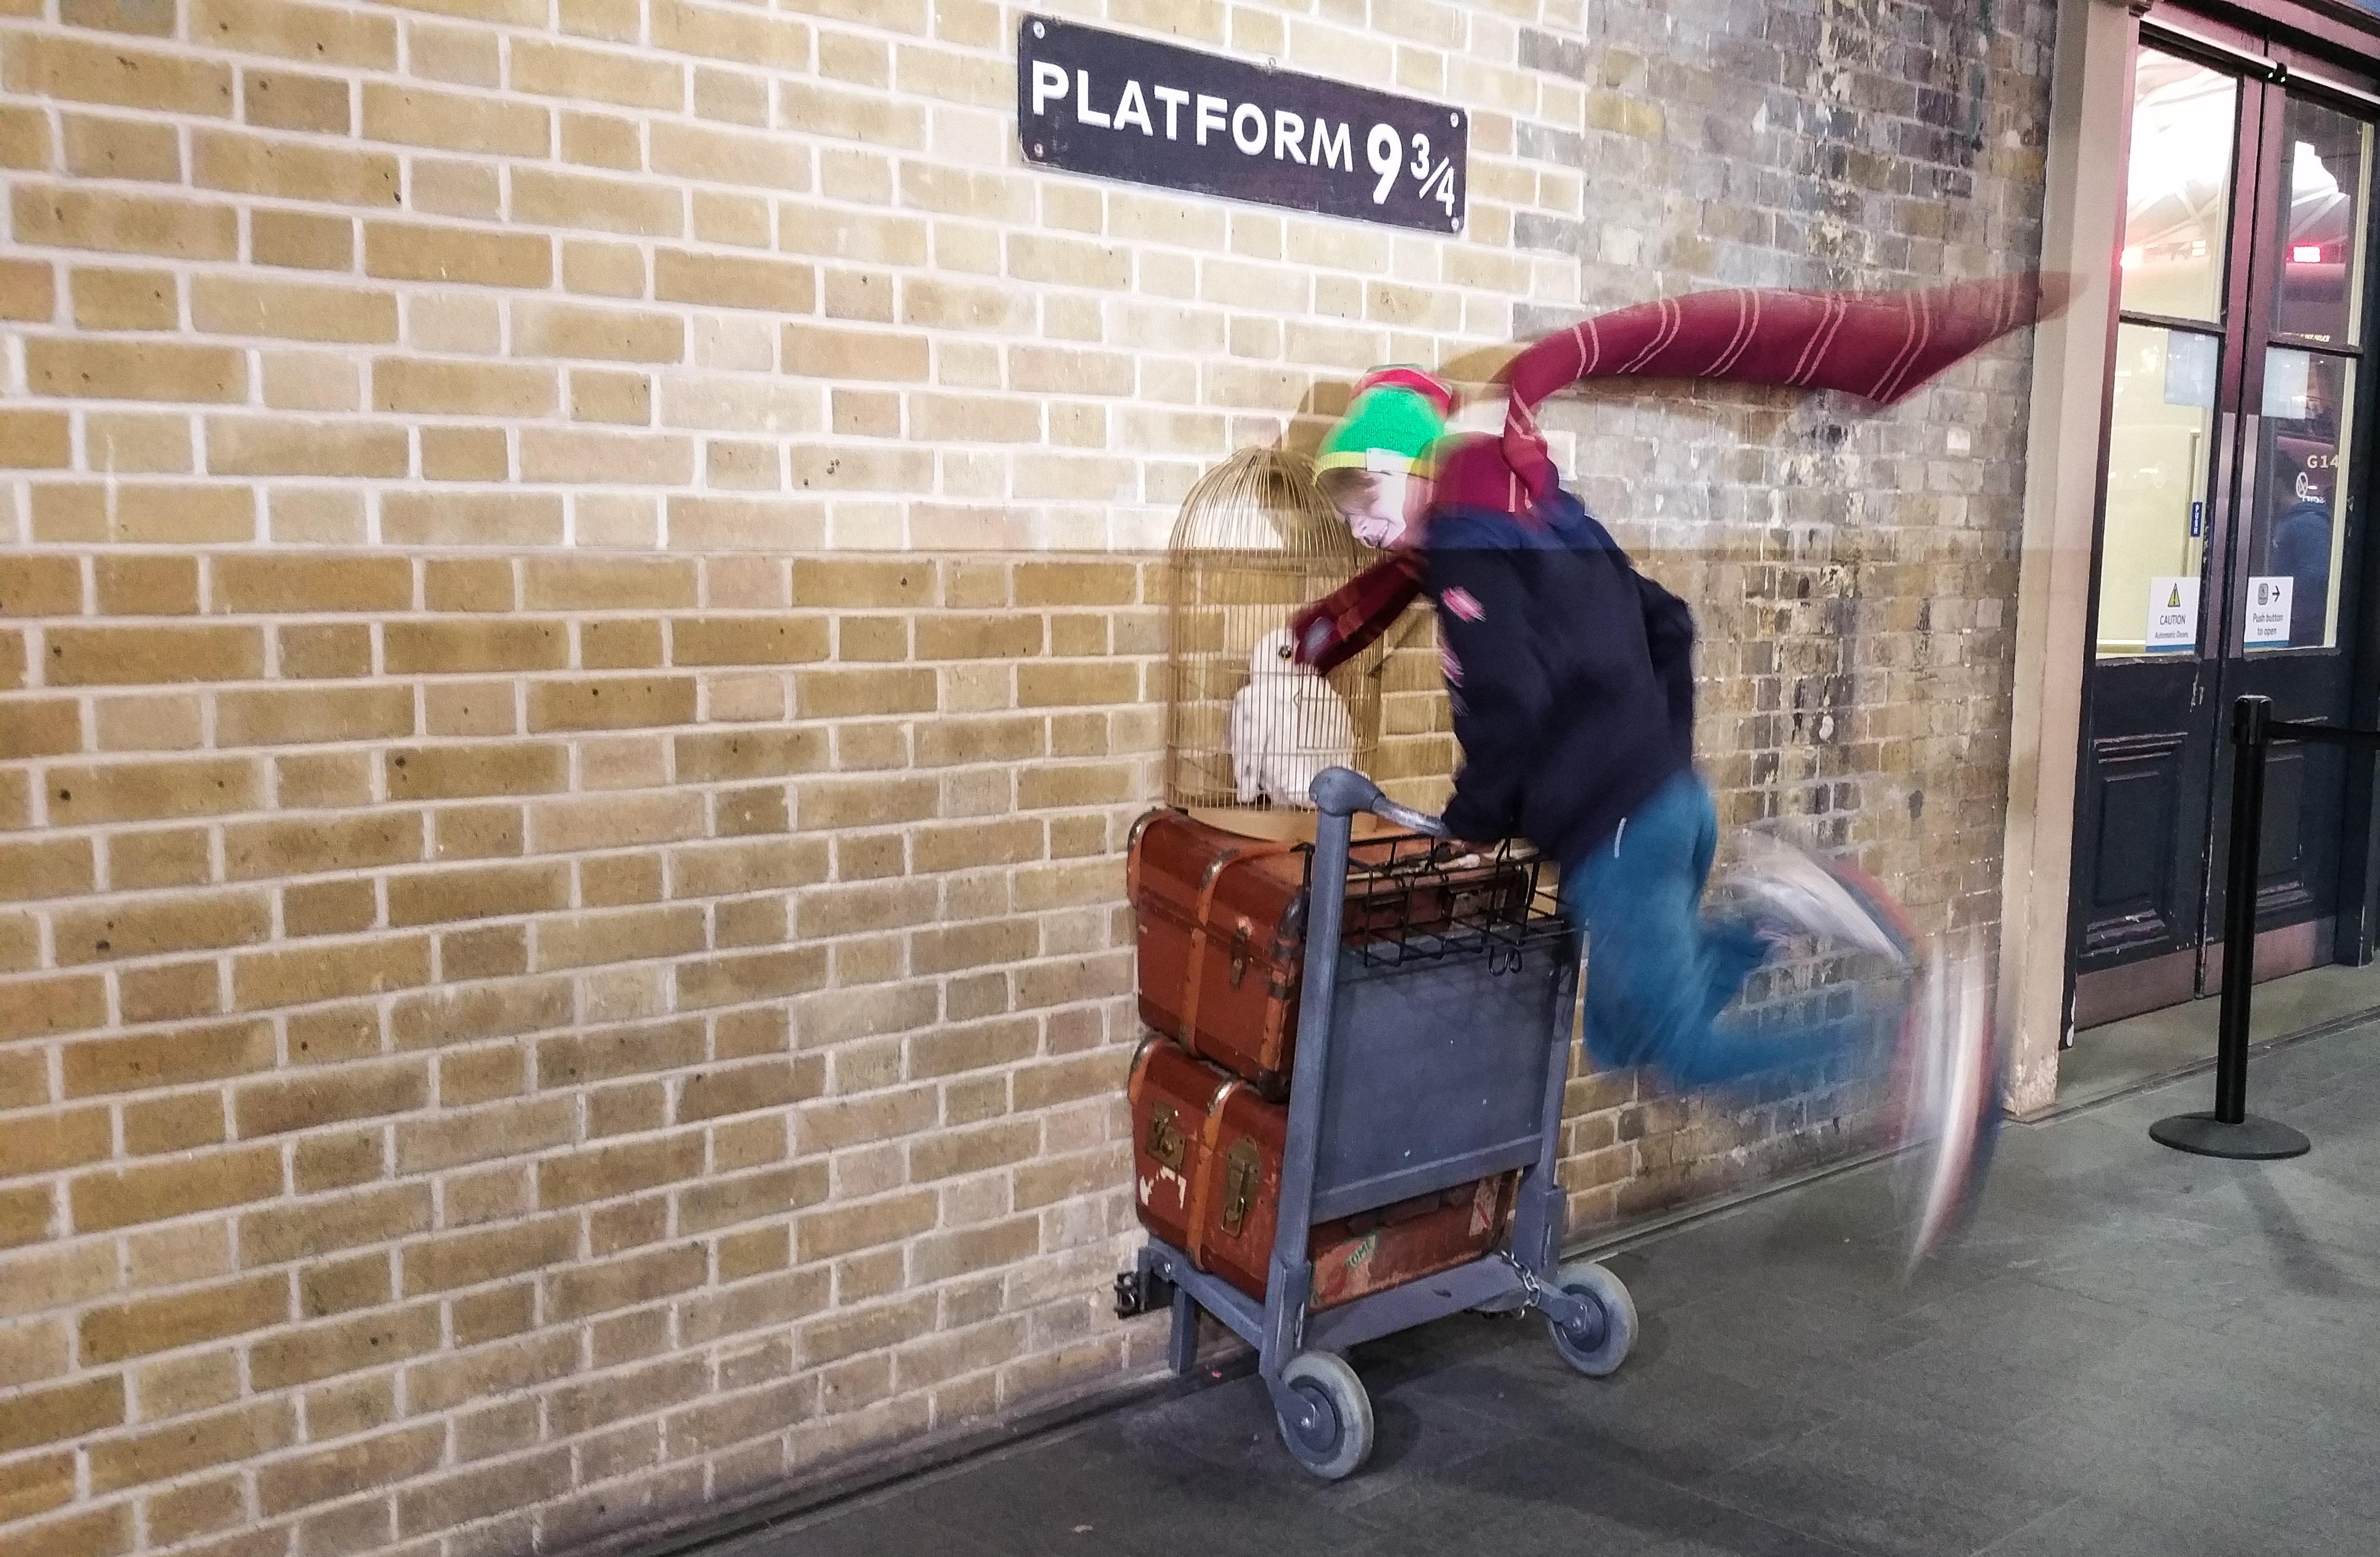 Harry Potter, Kings Cross station, perrong 9 3/4